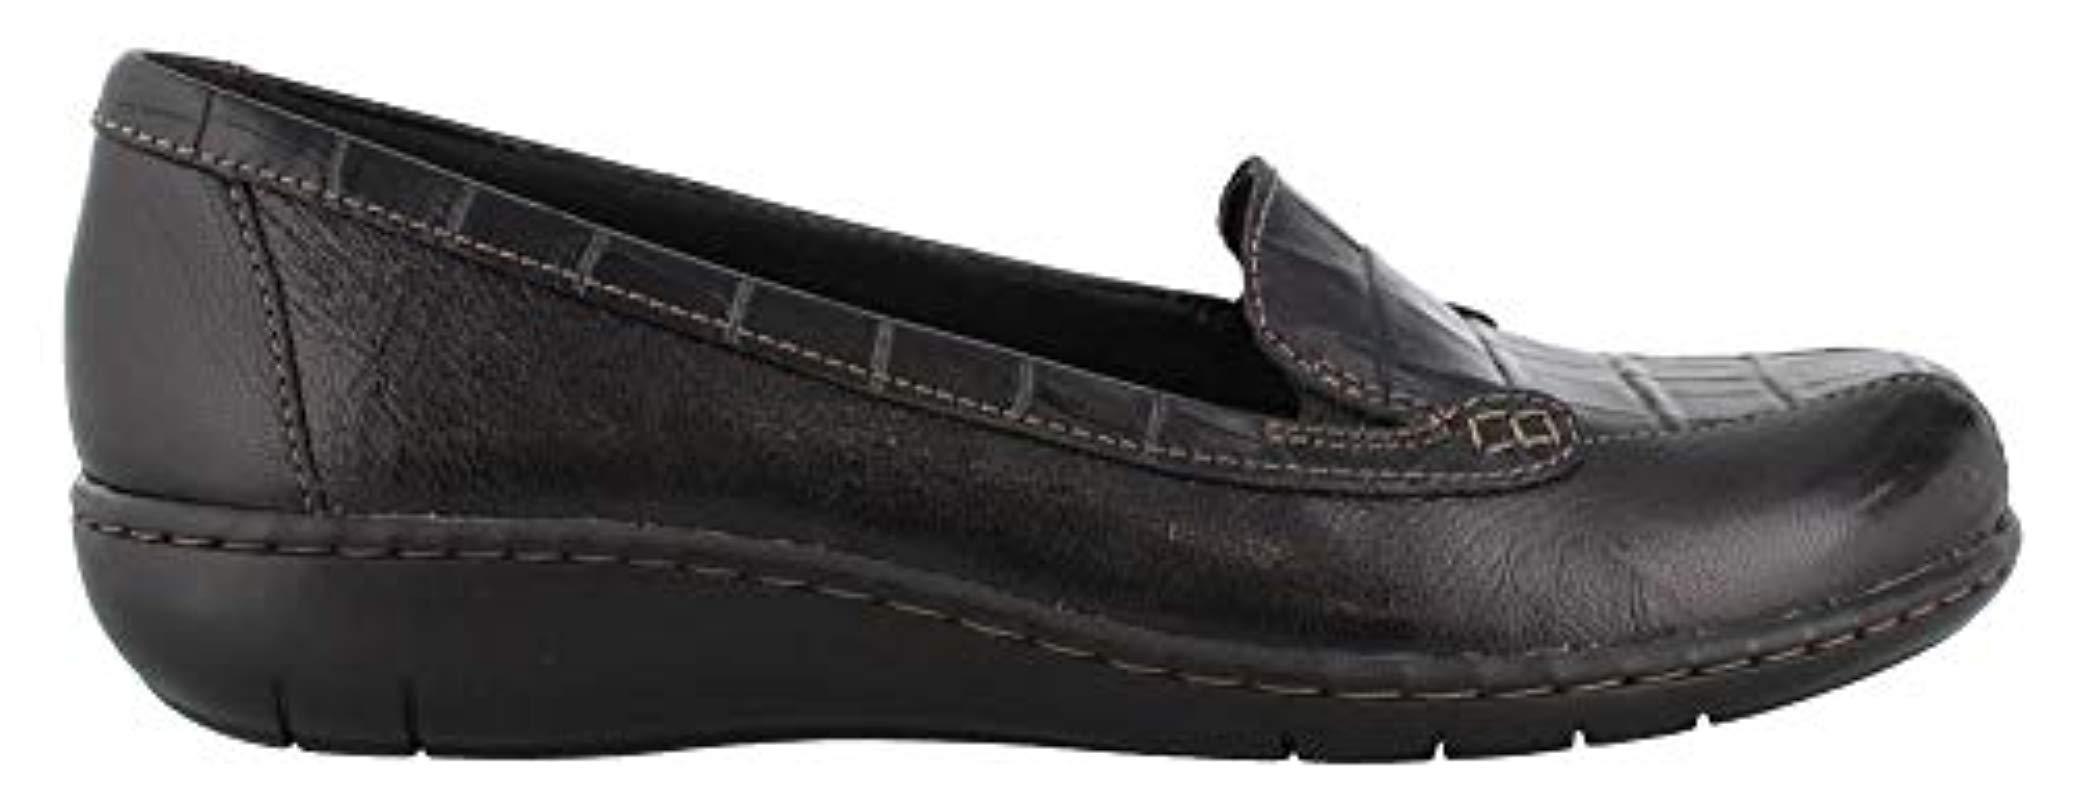 Clarks Denim Bayou Q Loafer in Black